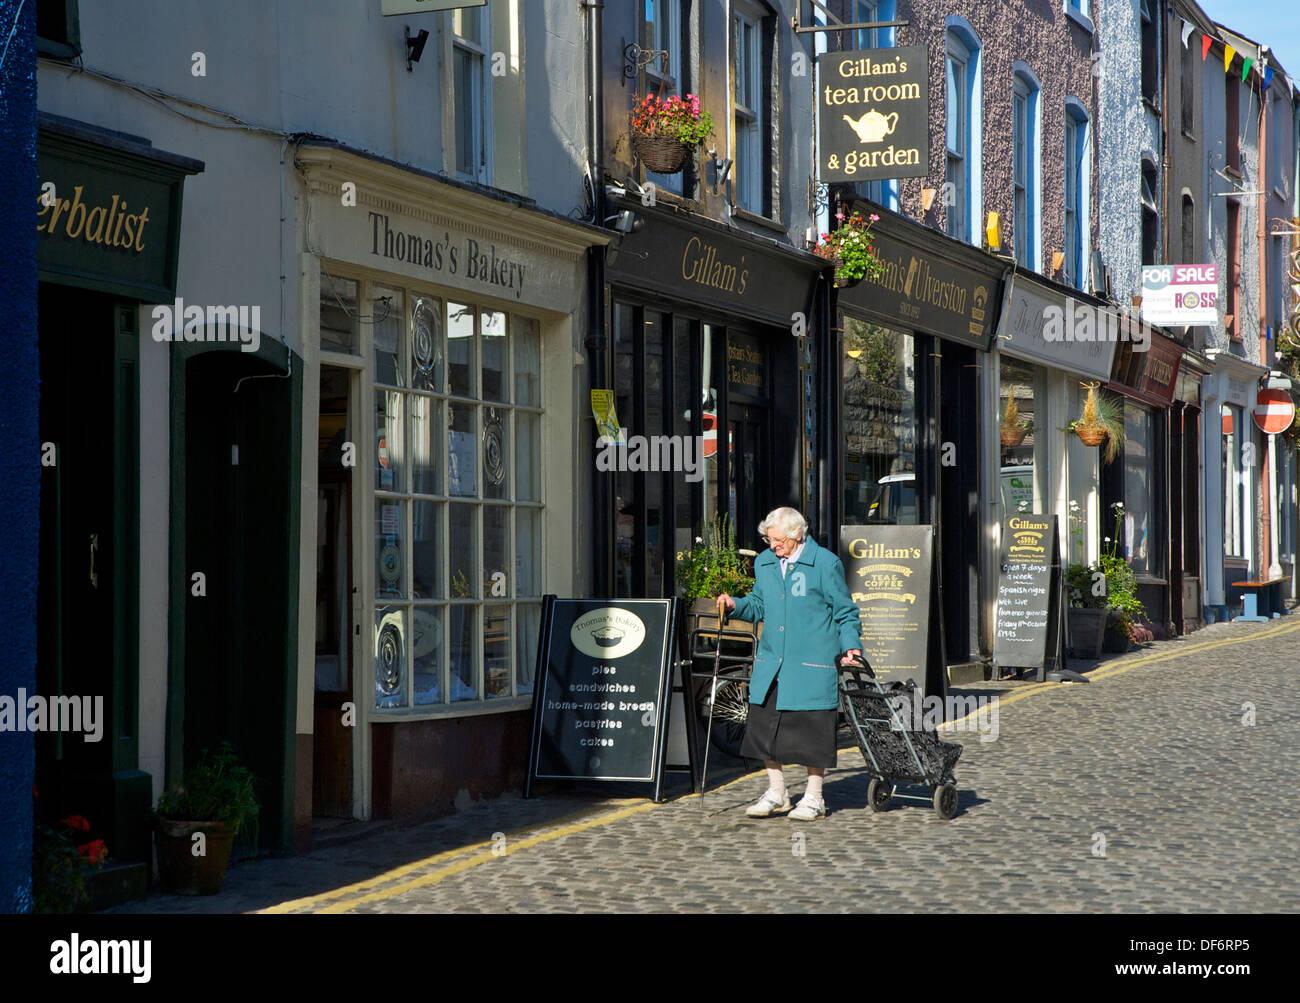 Old lady on Market Street, Ulverston, Cumbria, England UK - Stock Image